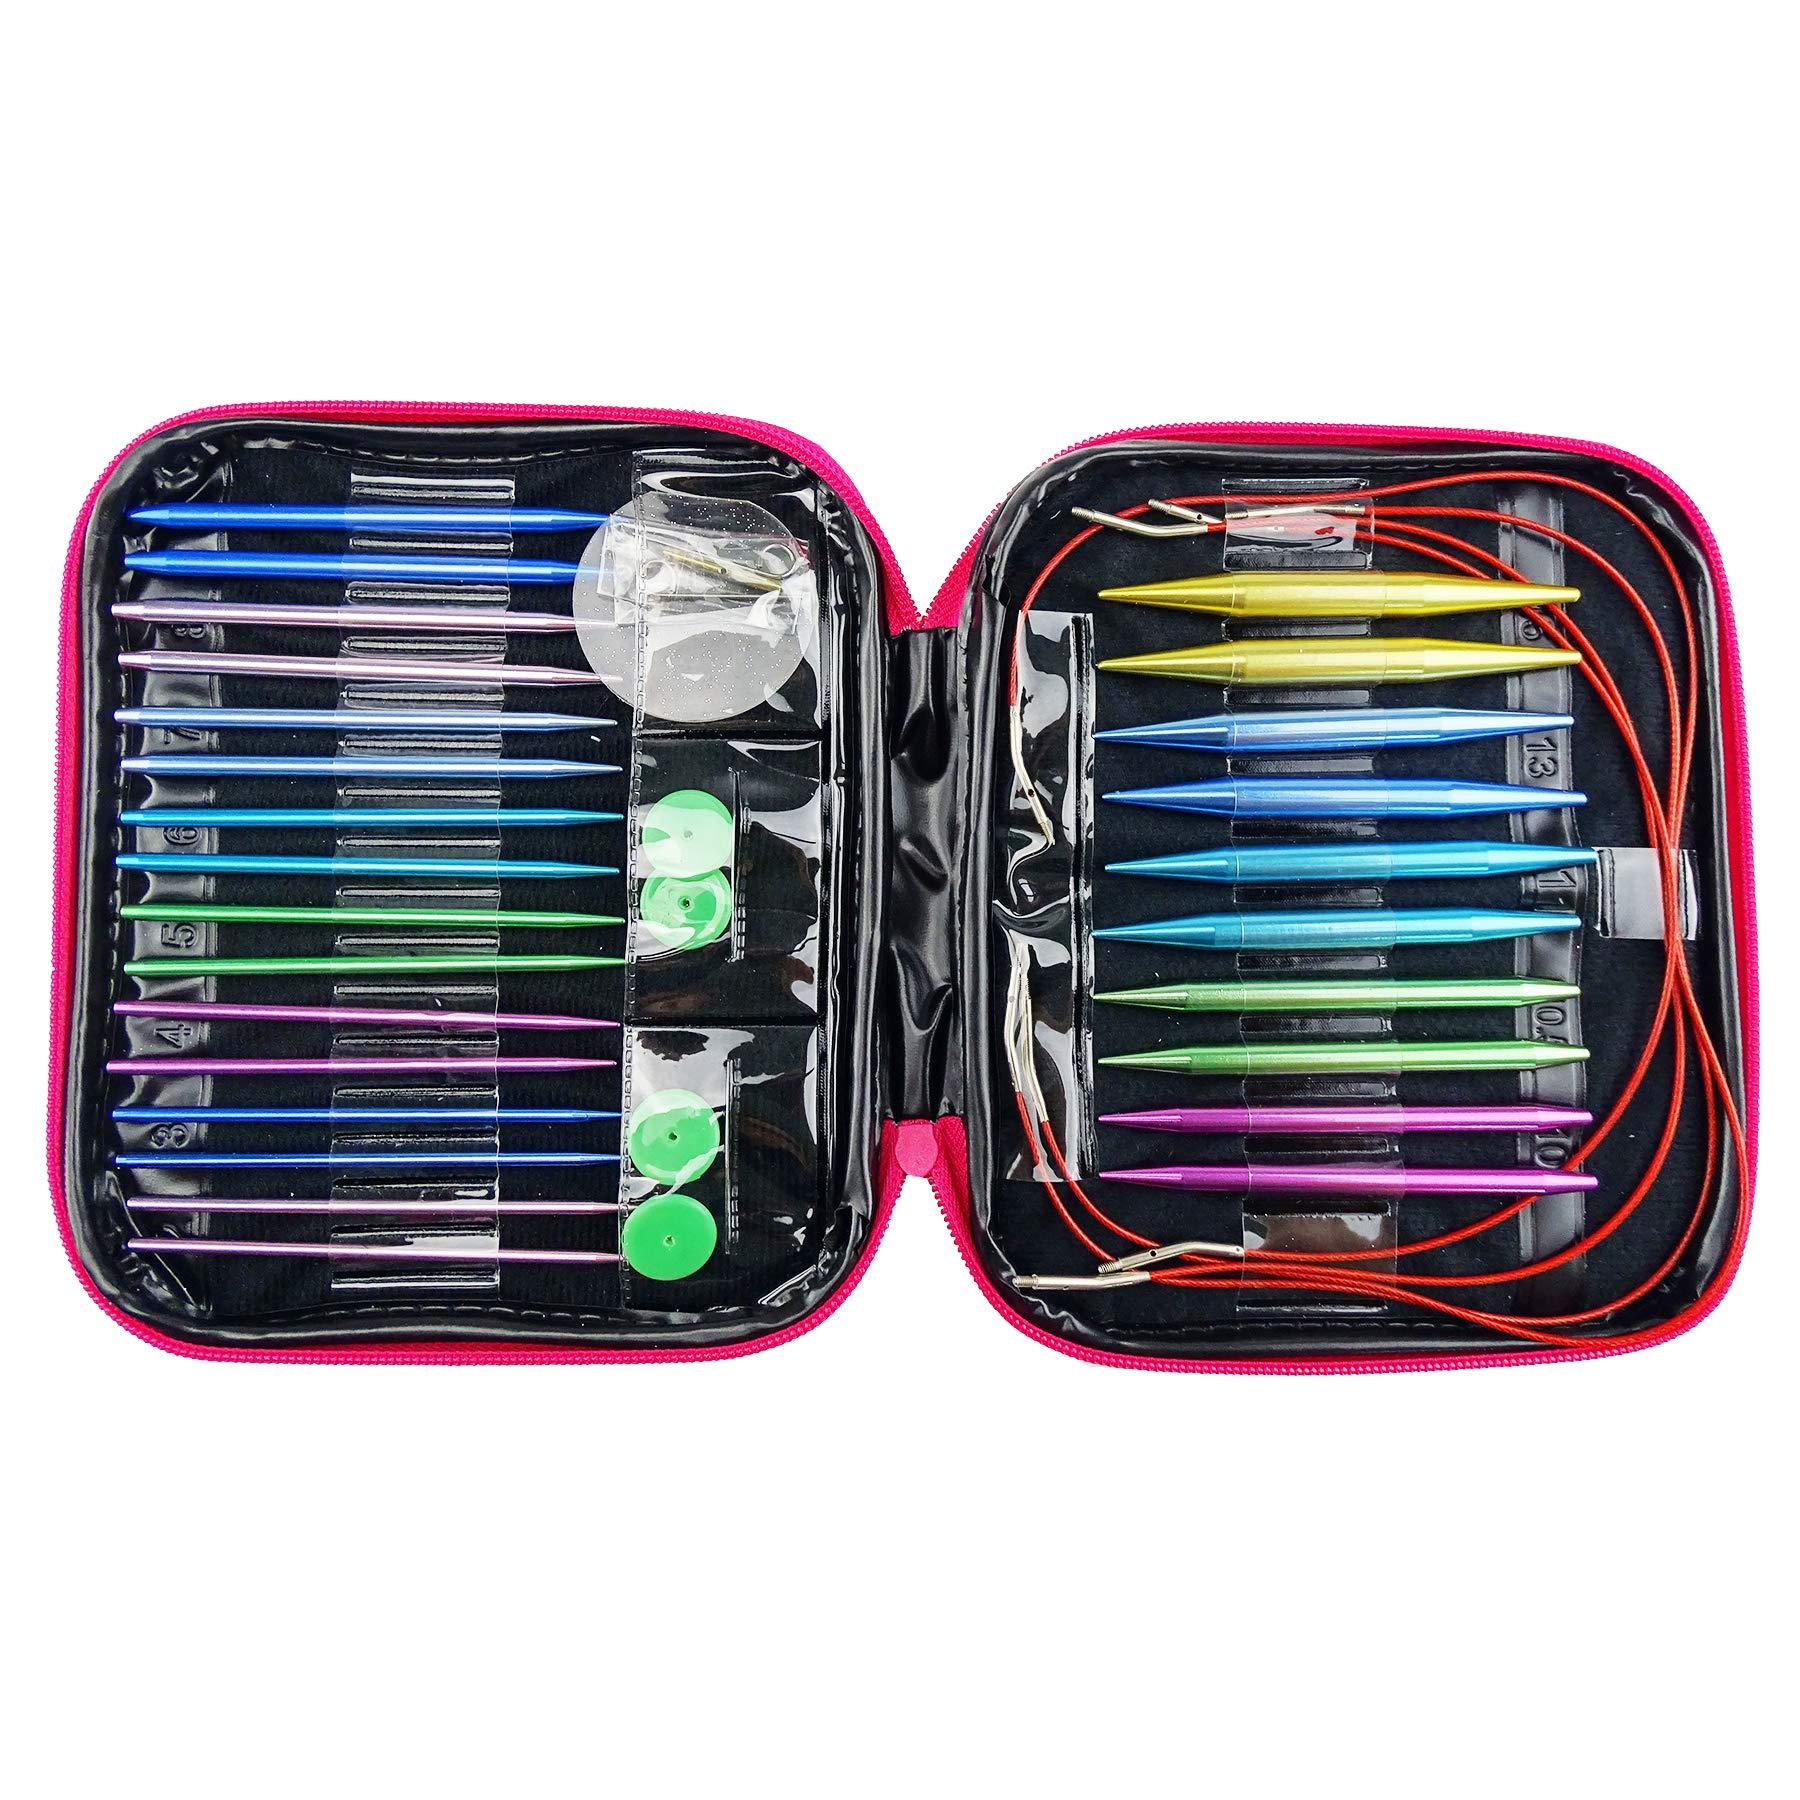 Hanperal 13pcs Aluminum Circular Knitting Needles Set, Interchangeable Needles Set for Handmade Knitting Sweater, Scarf